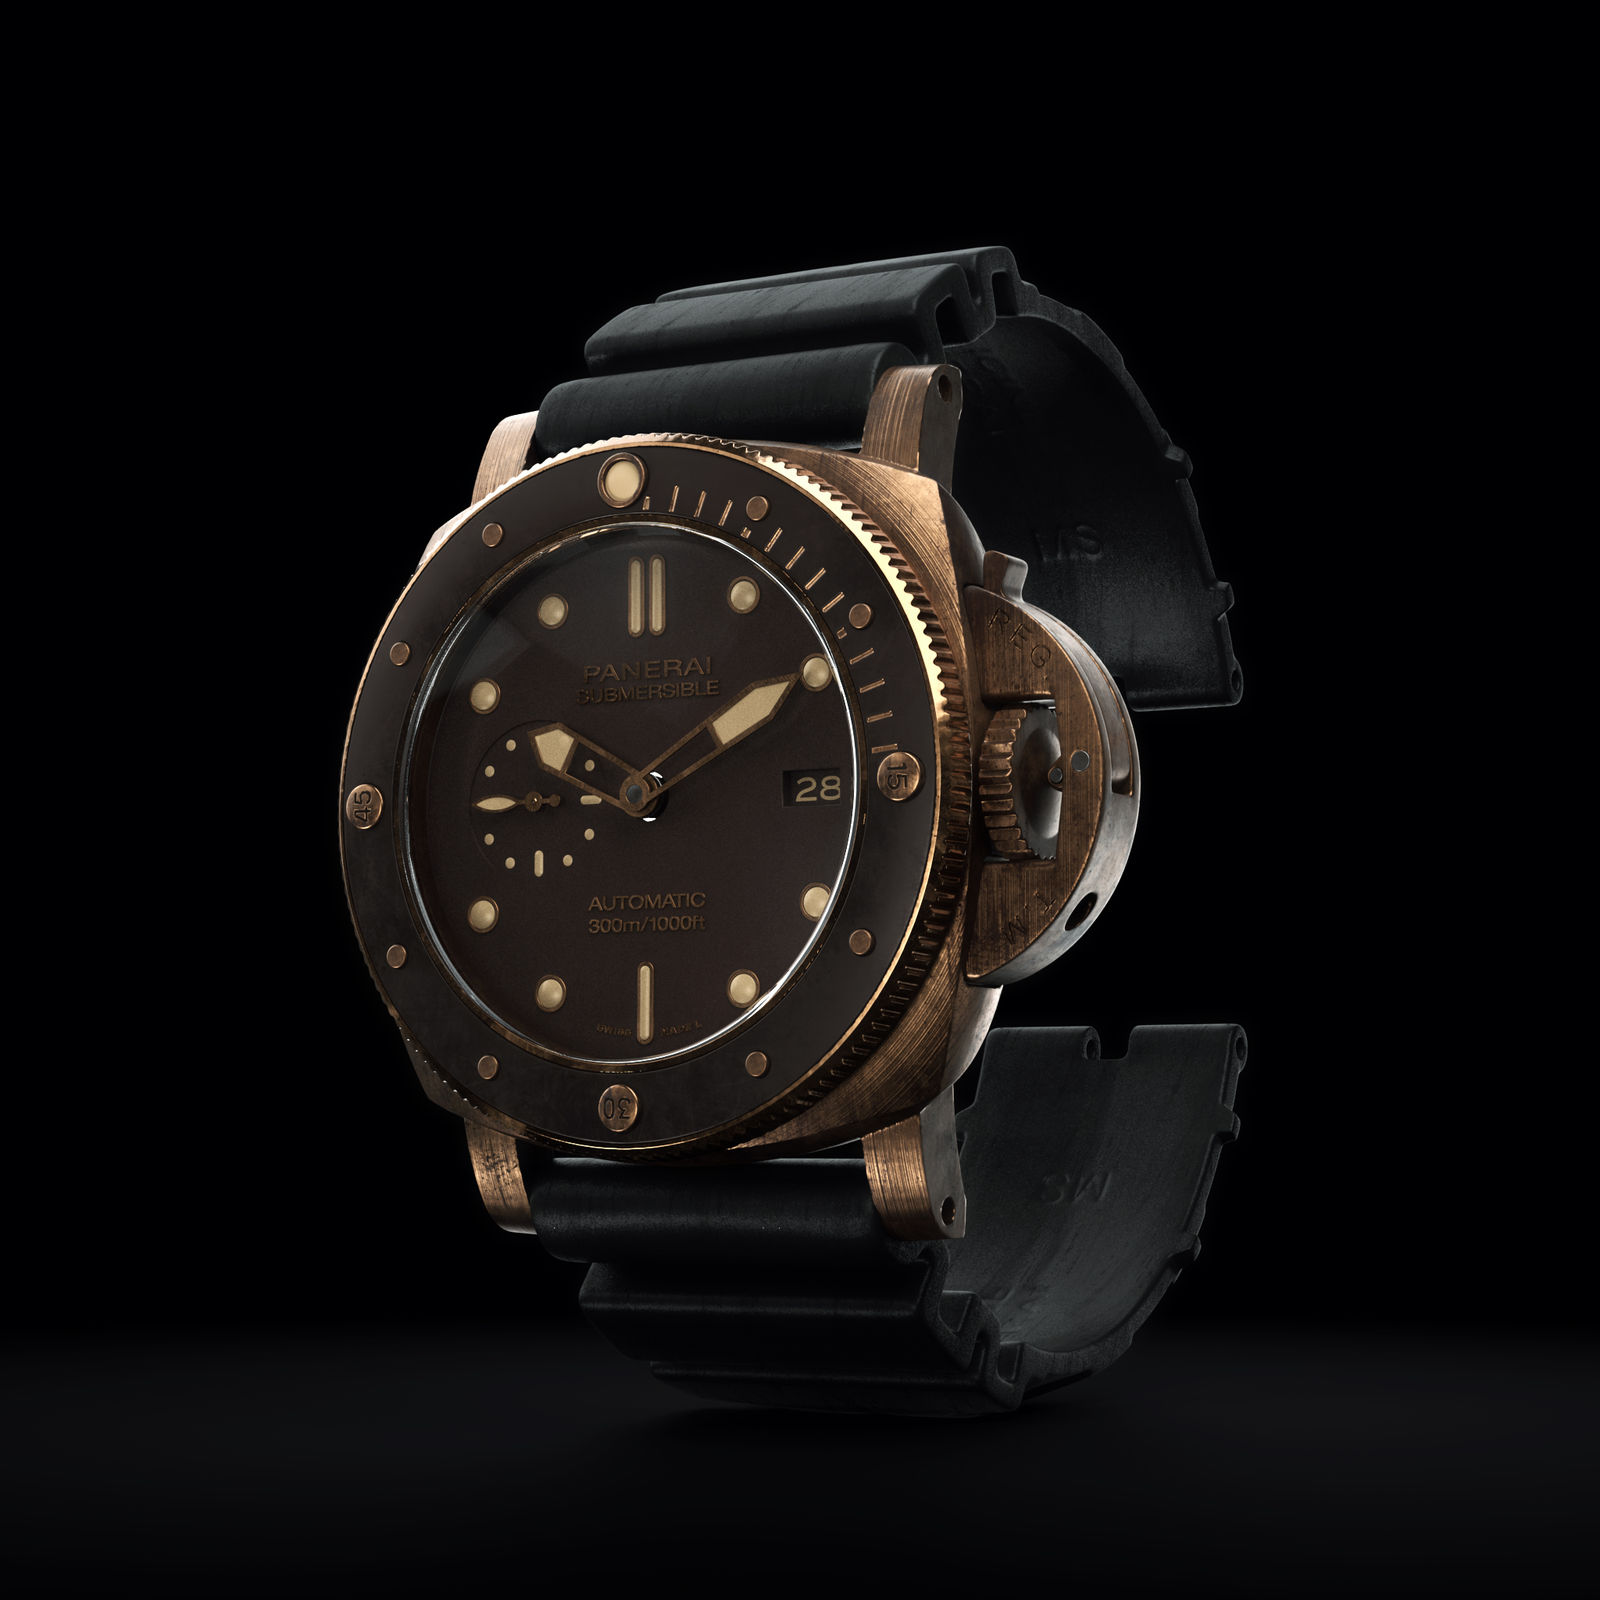 3D render of the Bronzo Panerai watch